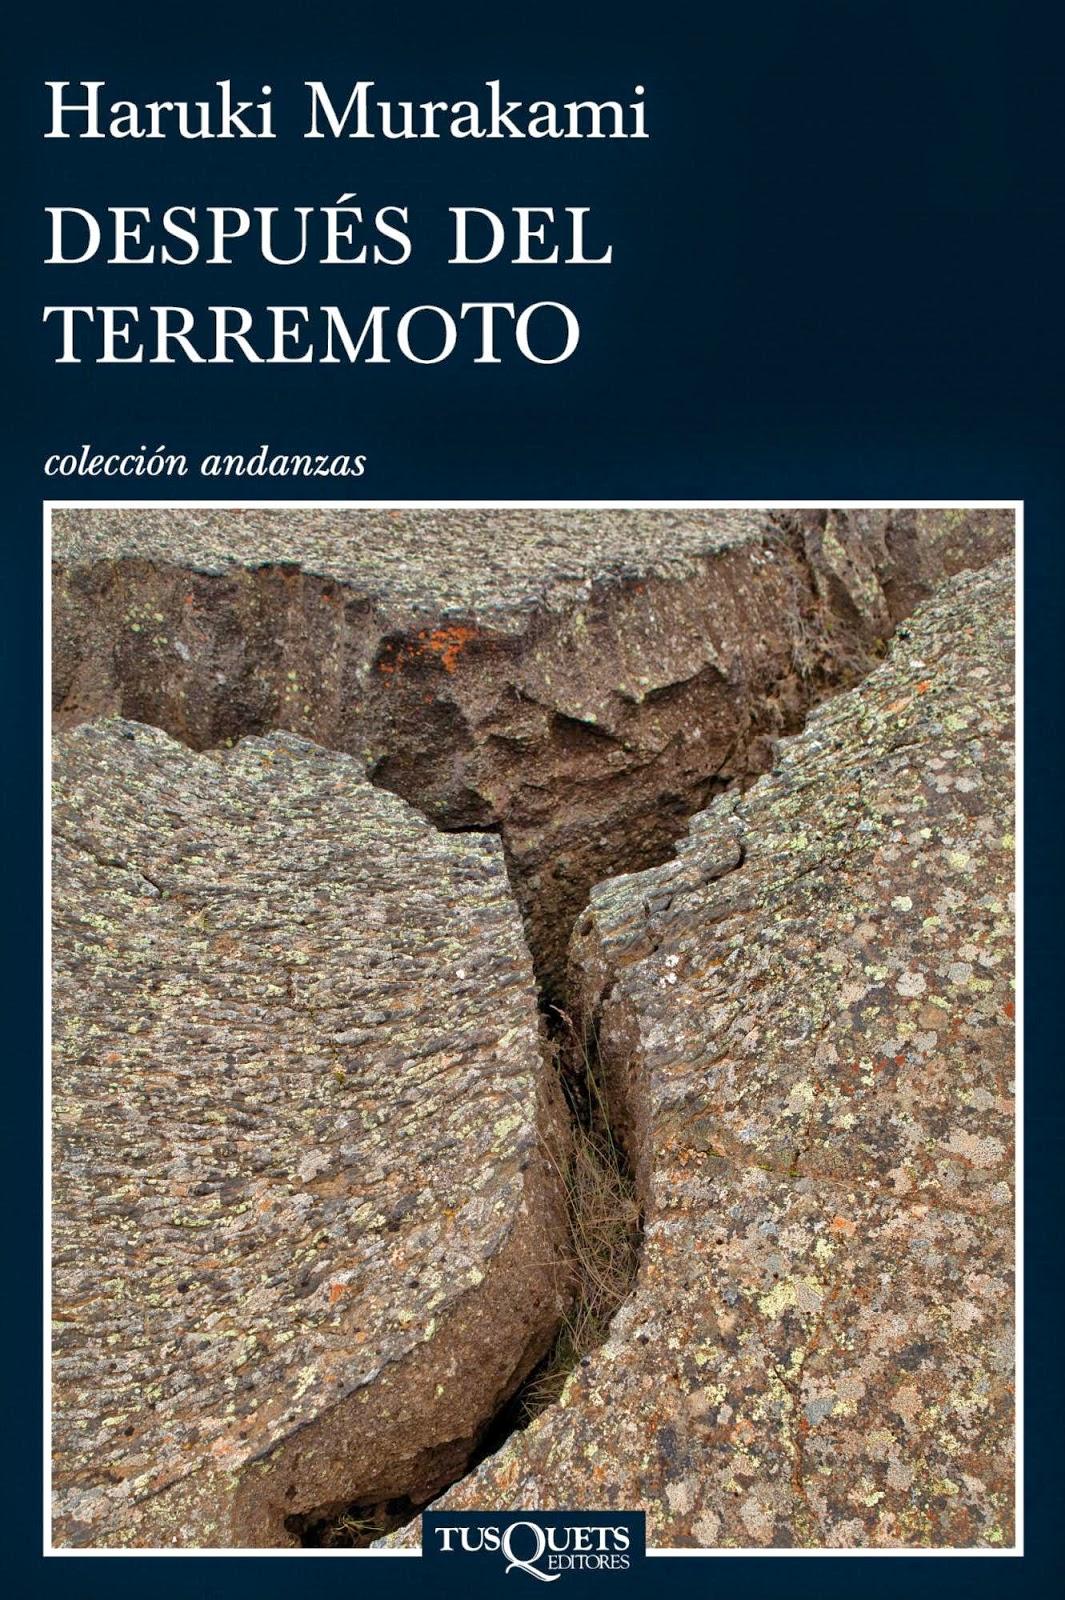 Después del terremoto, Murakami